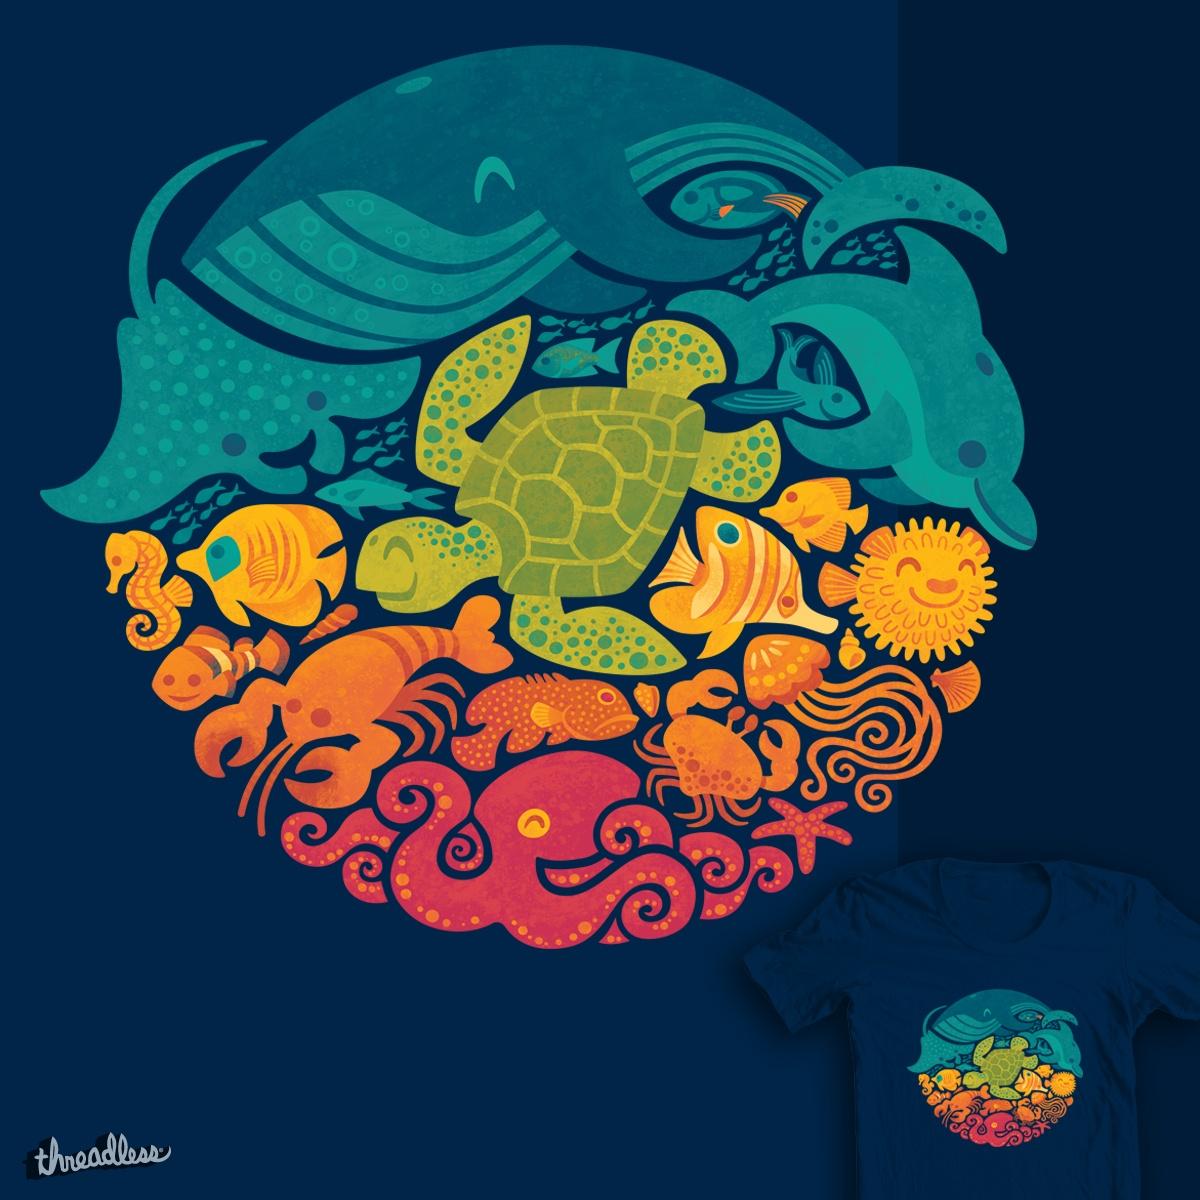 Aquatic Rainbow by waynem on Threadless